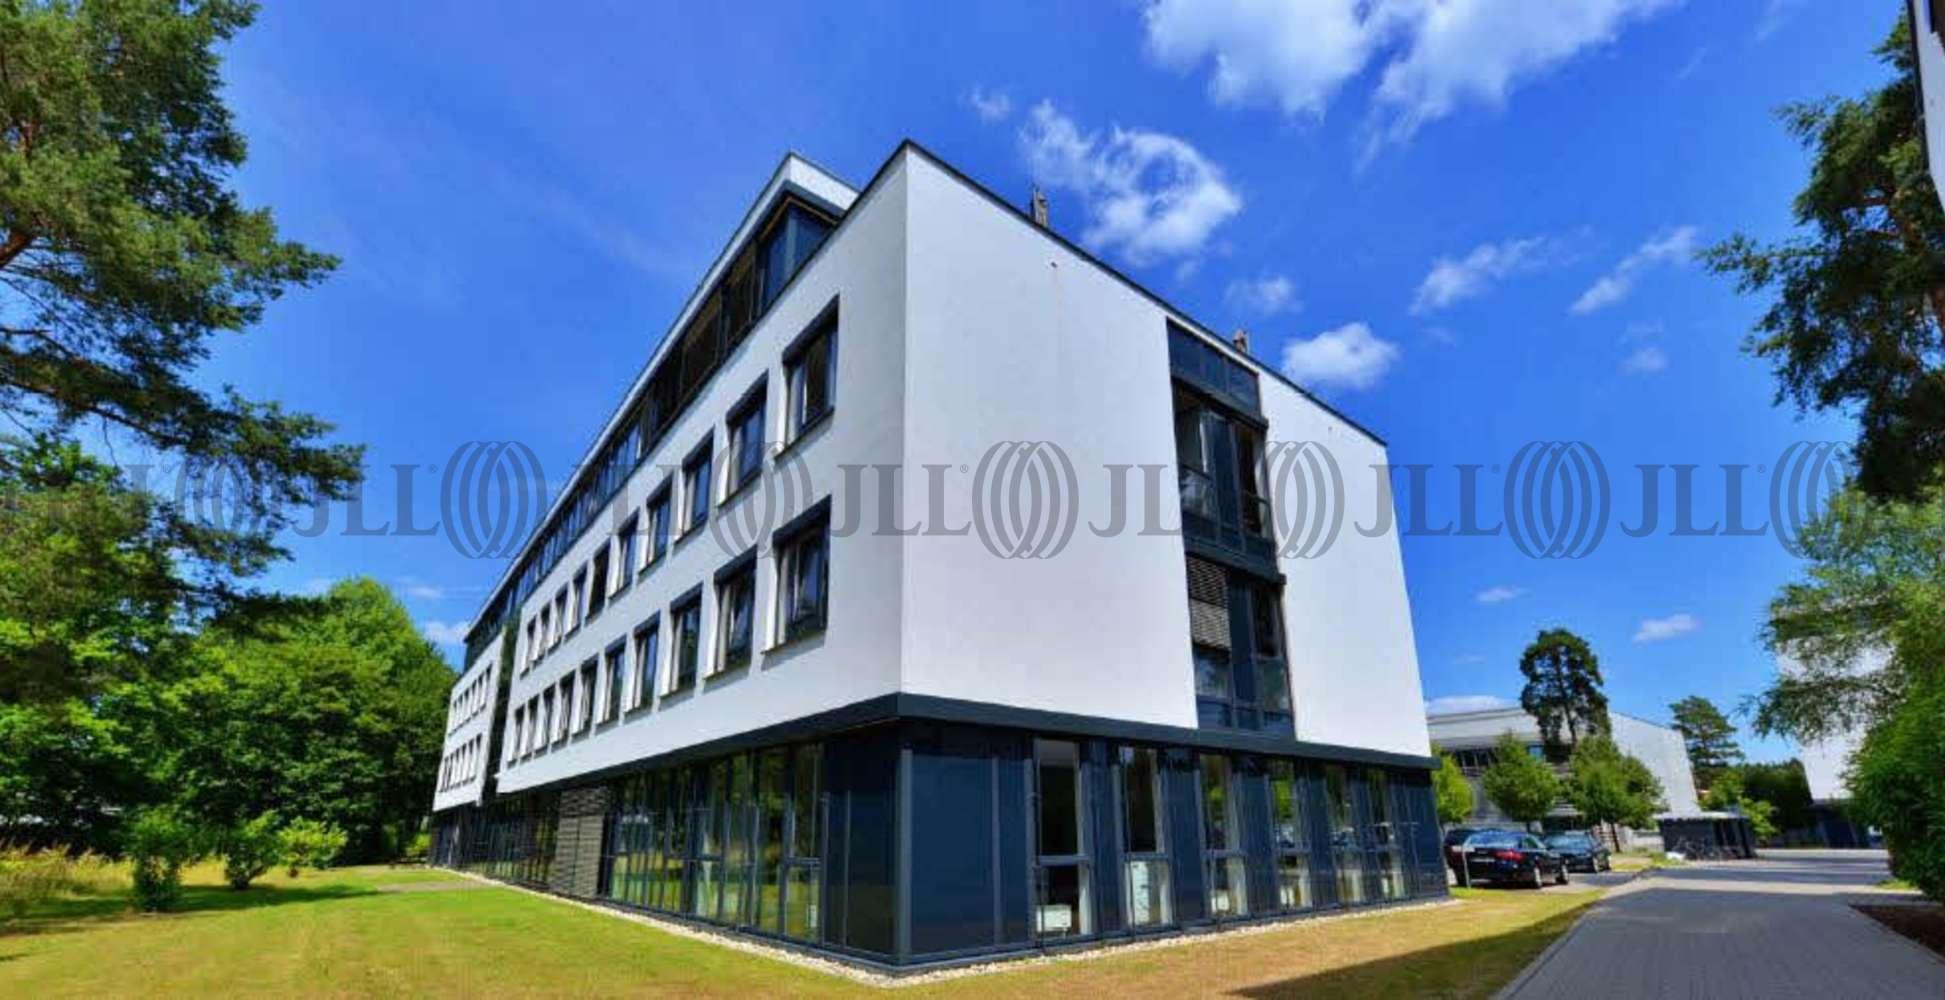 Büros Nürnberg, 90409 - Büro - Nürnberg, Großreuth h d Veste - M1504 - 10804573